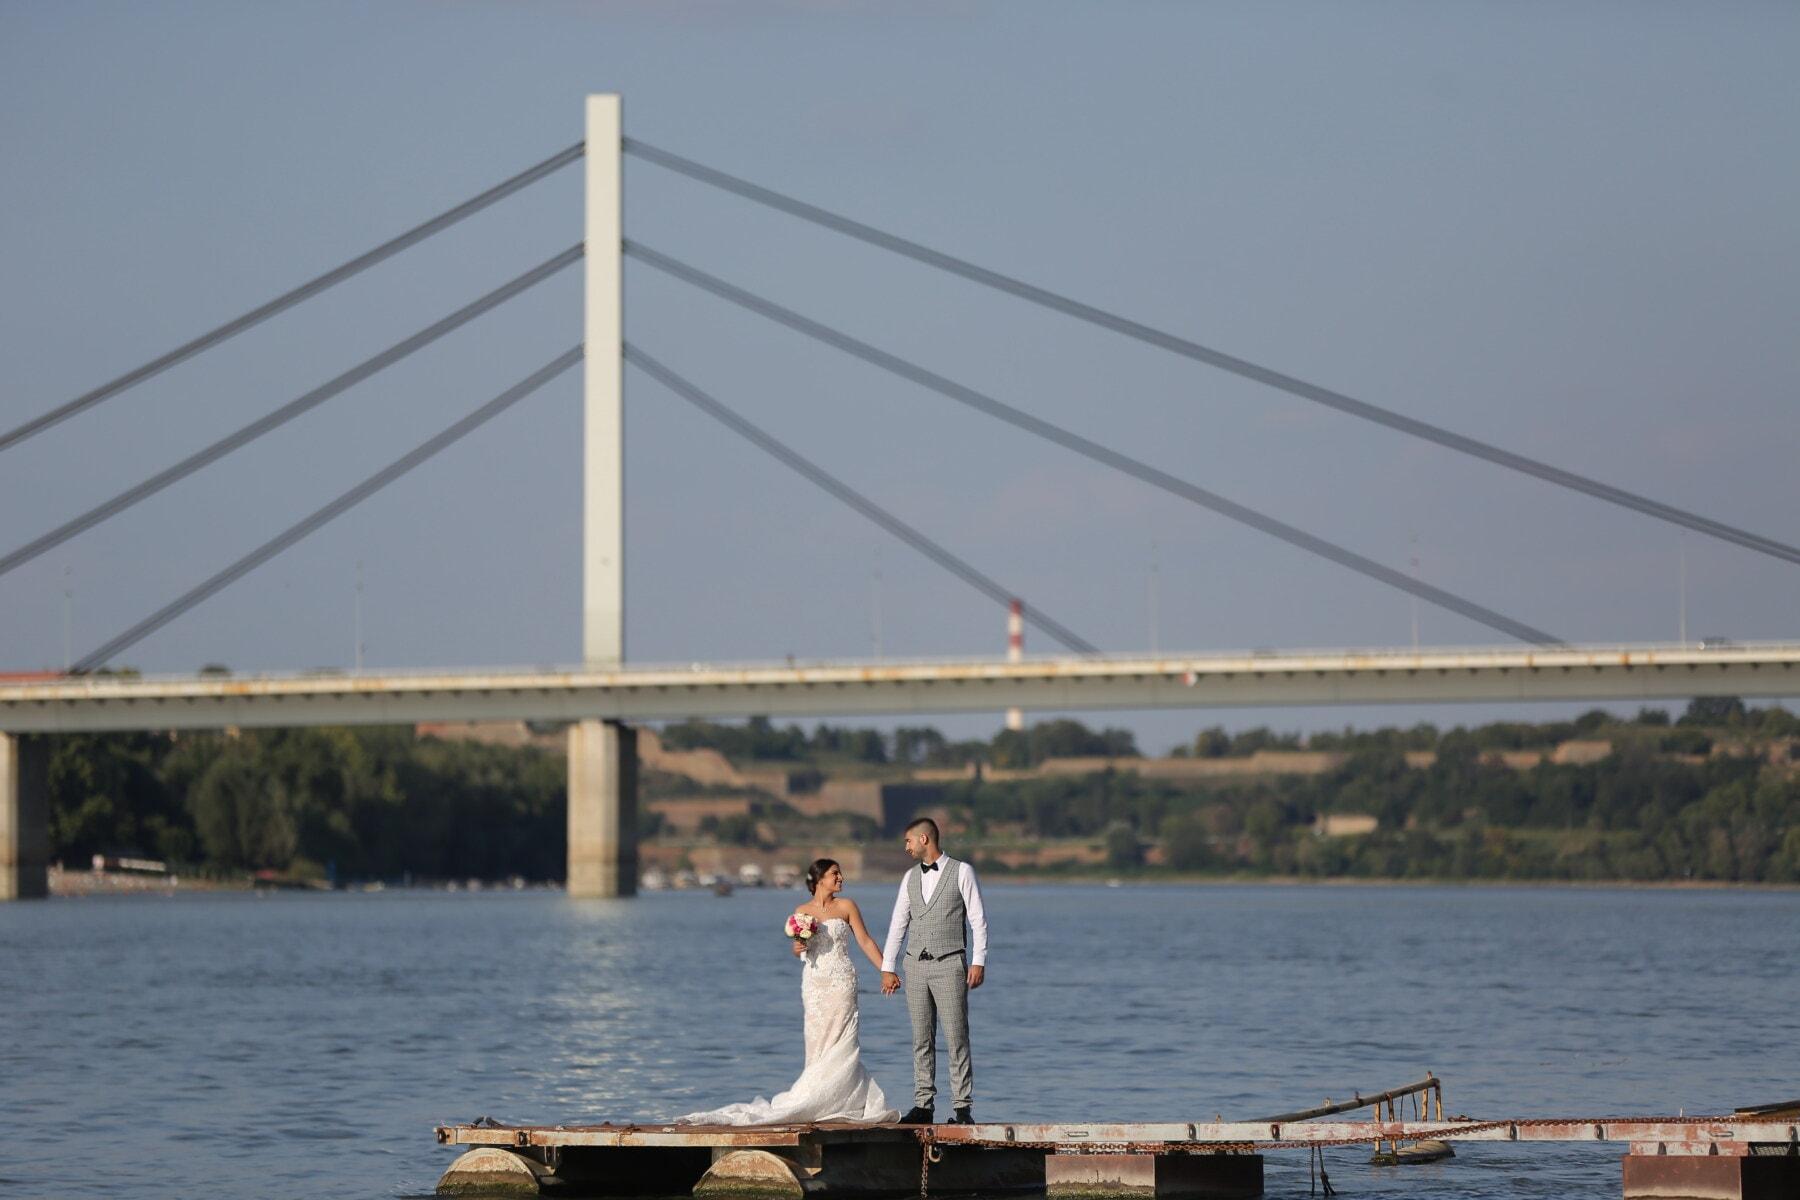 Bräutigam, Jungvermählten, Braut, Hafen, Menschen, Brücke, Seebrücke, Wasser, Gerät, Fluss